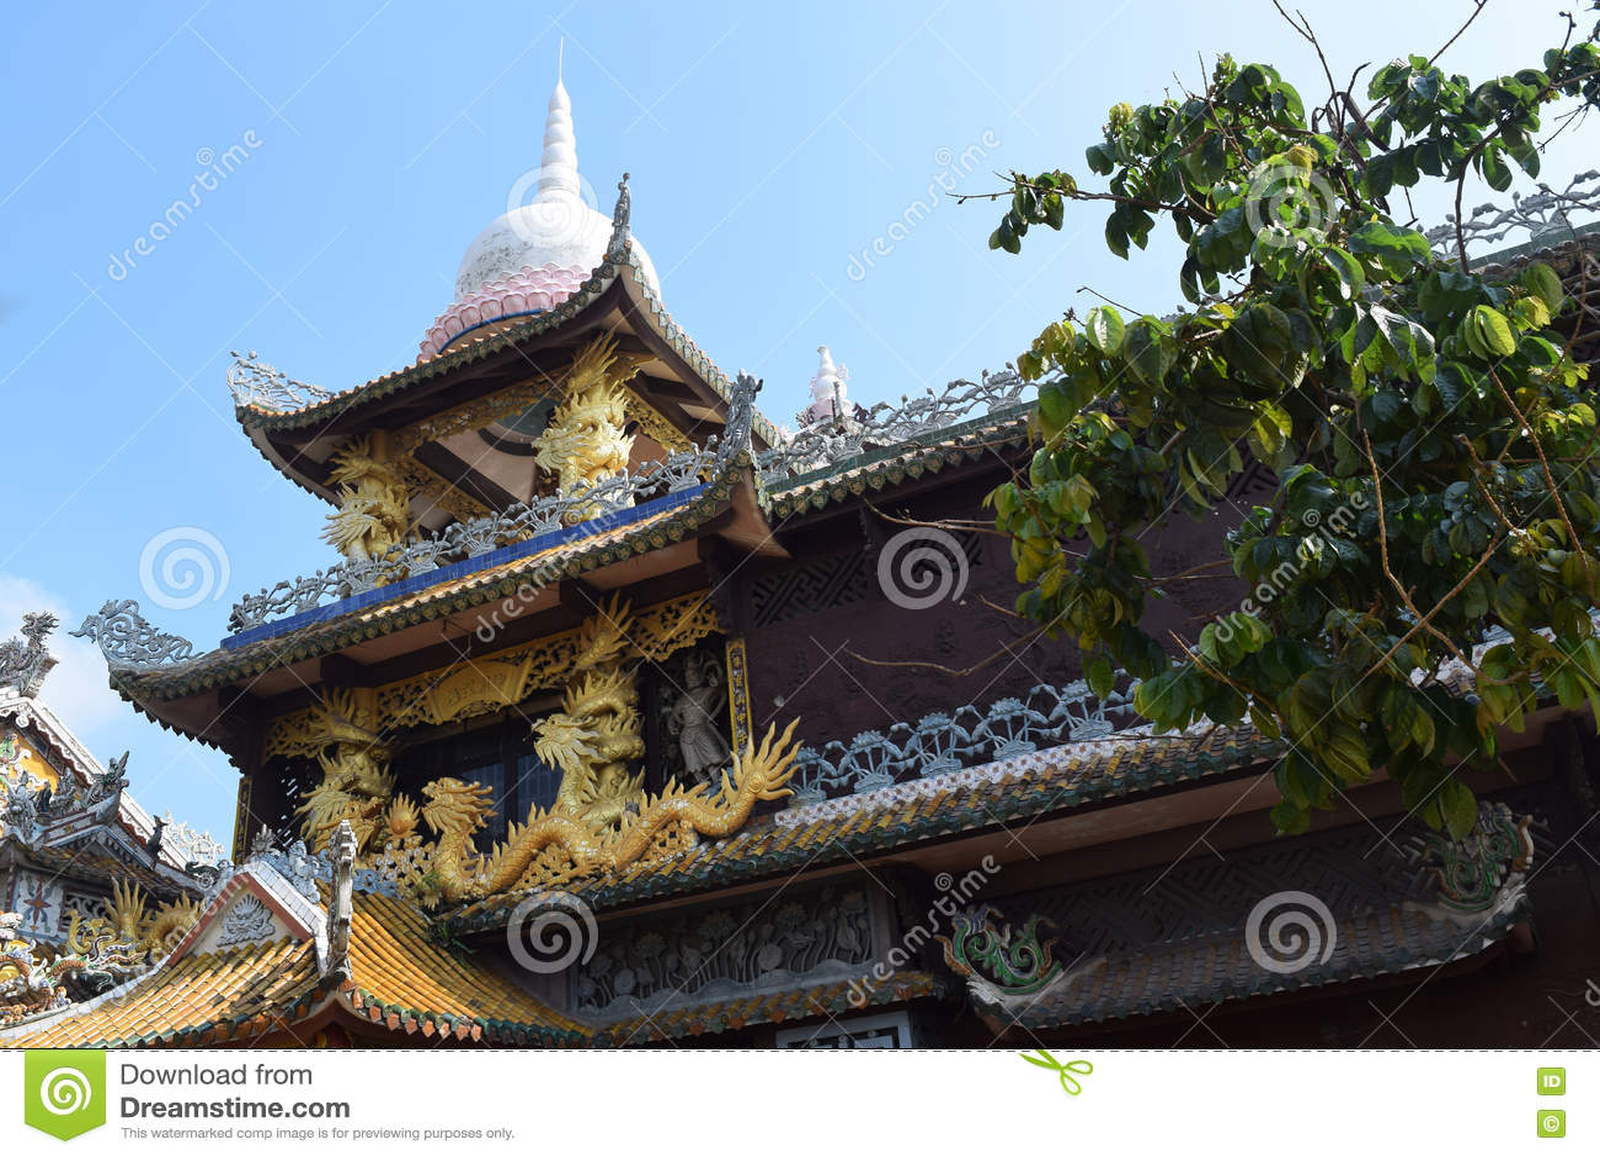 Chau Thoi świątynia w Binh Duong prowinci, Wietnam